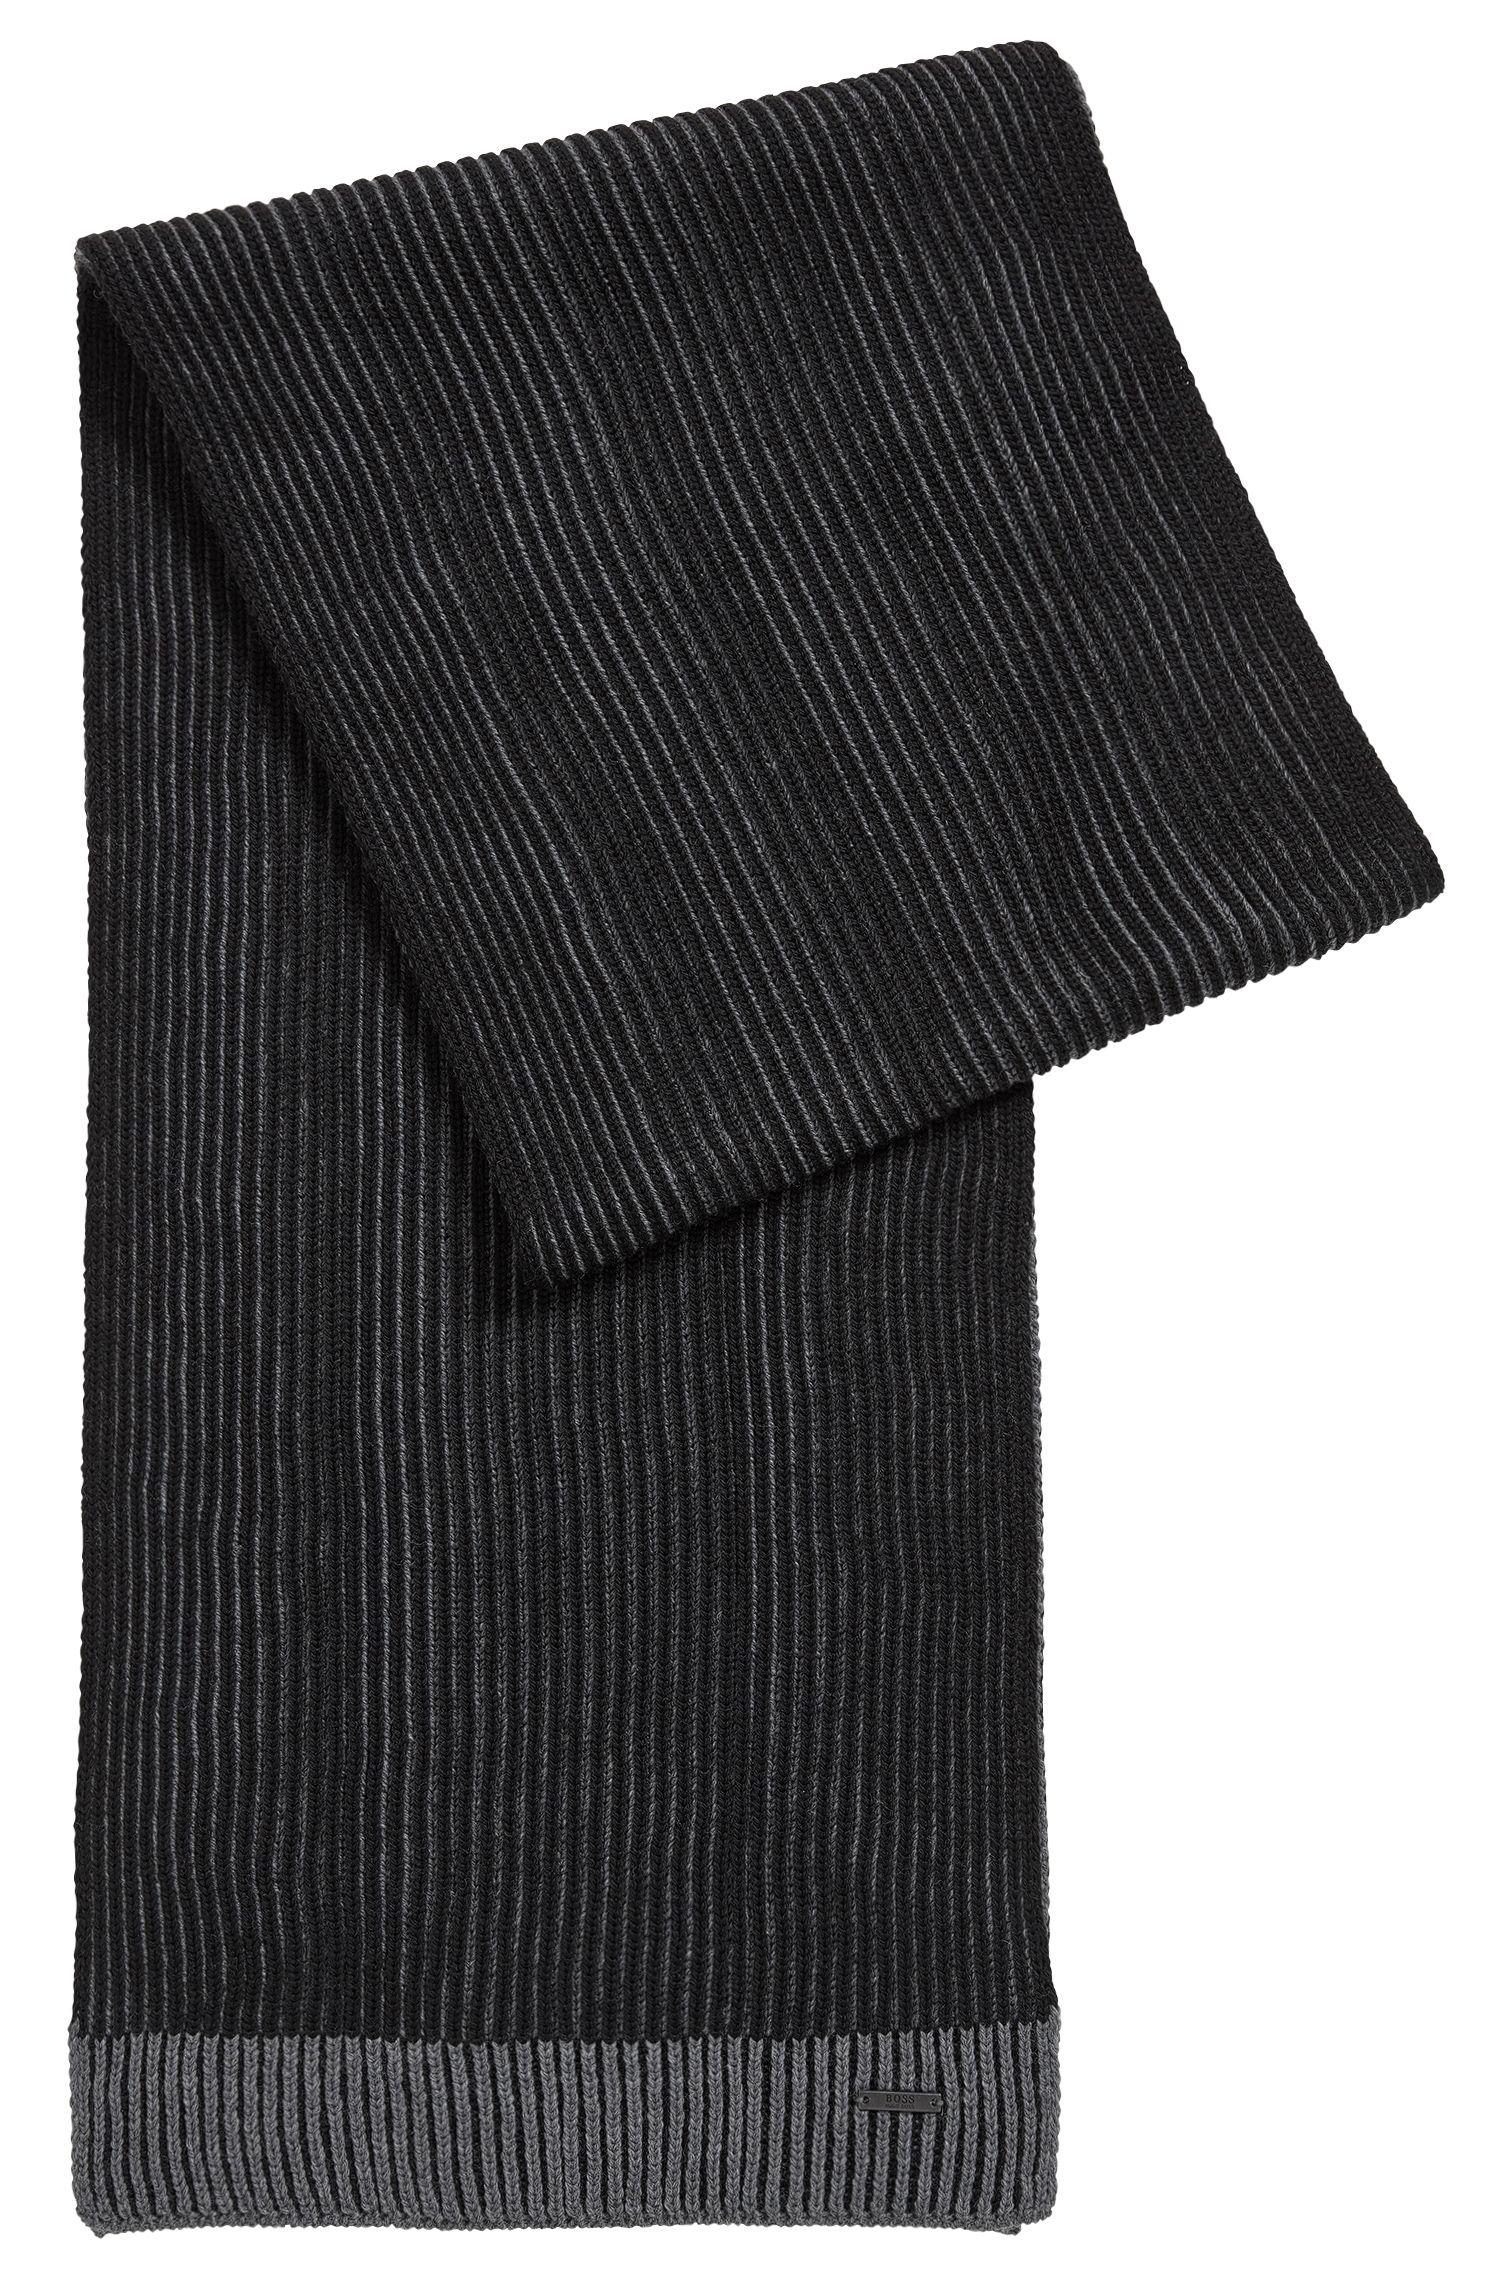 Textured Merino Wool Scarf | Balios WS